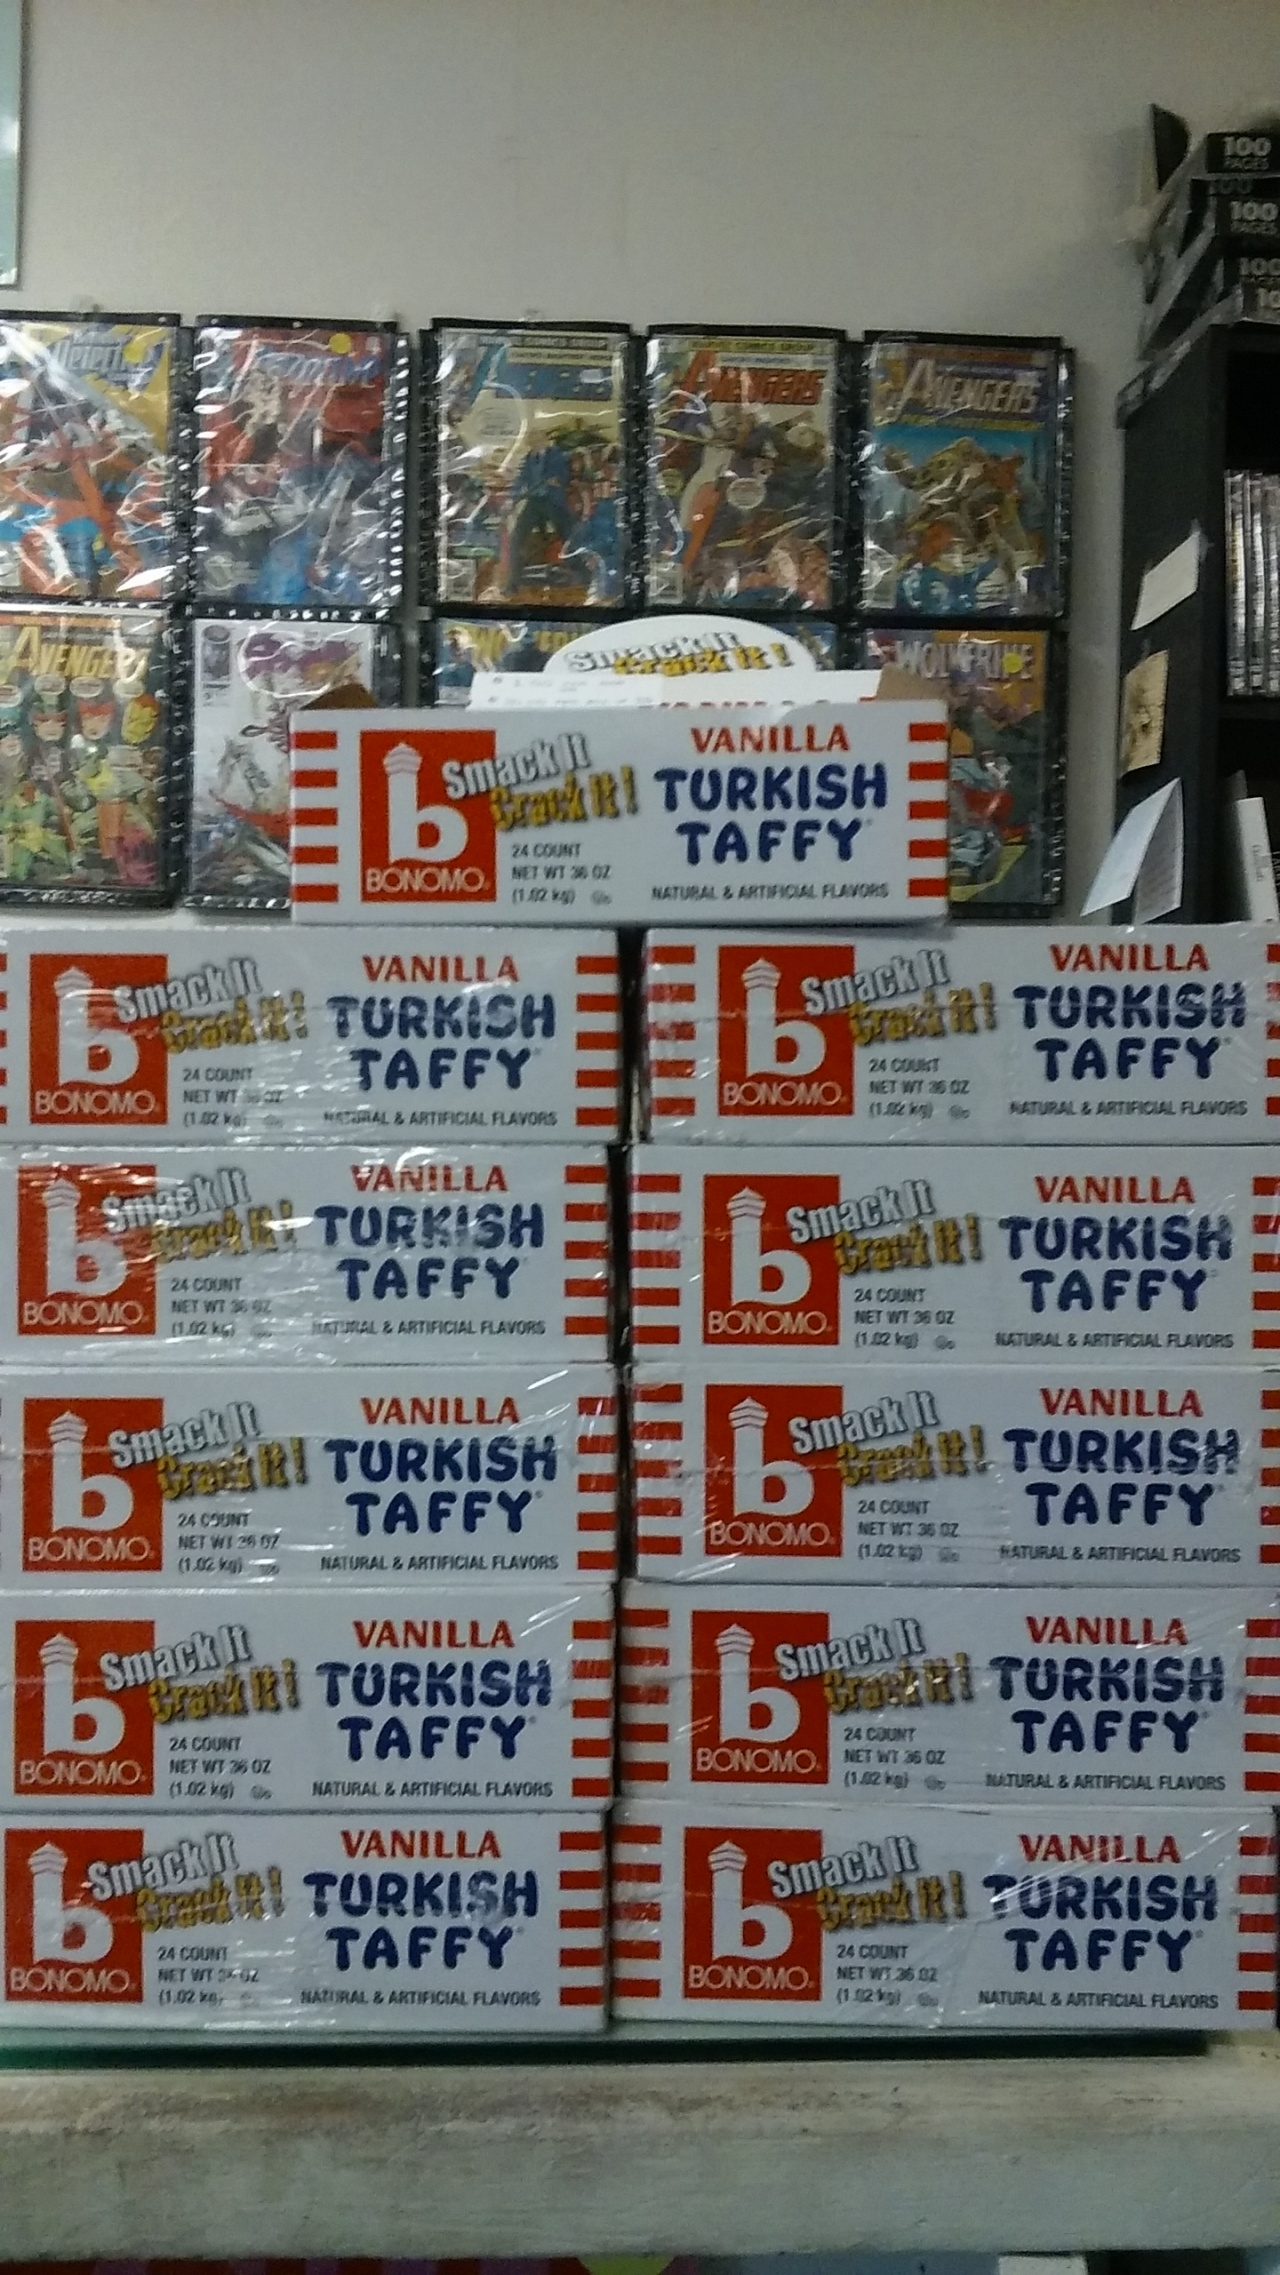 12132015 - turkishtaffy pic 1